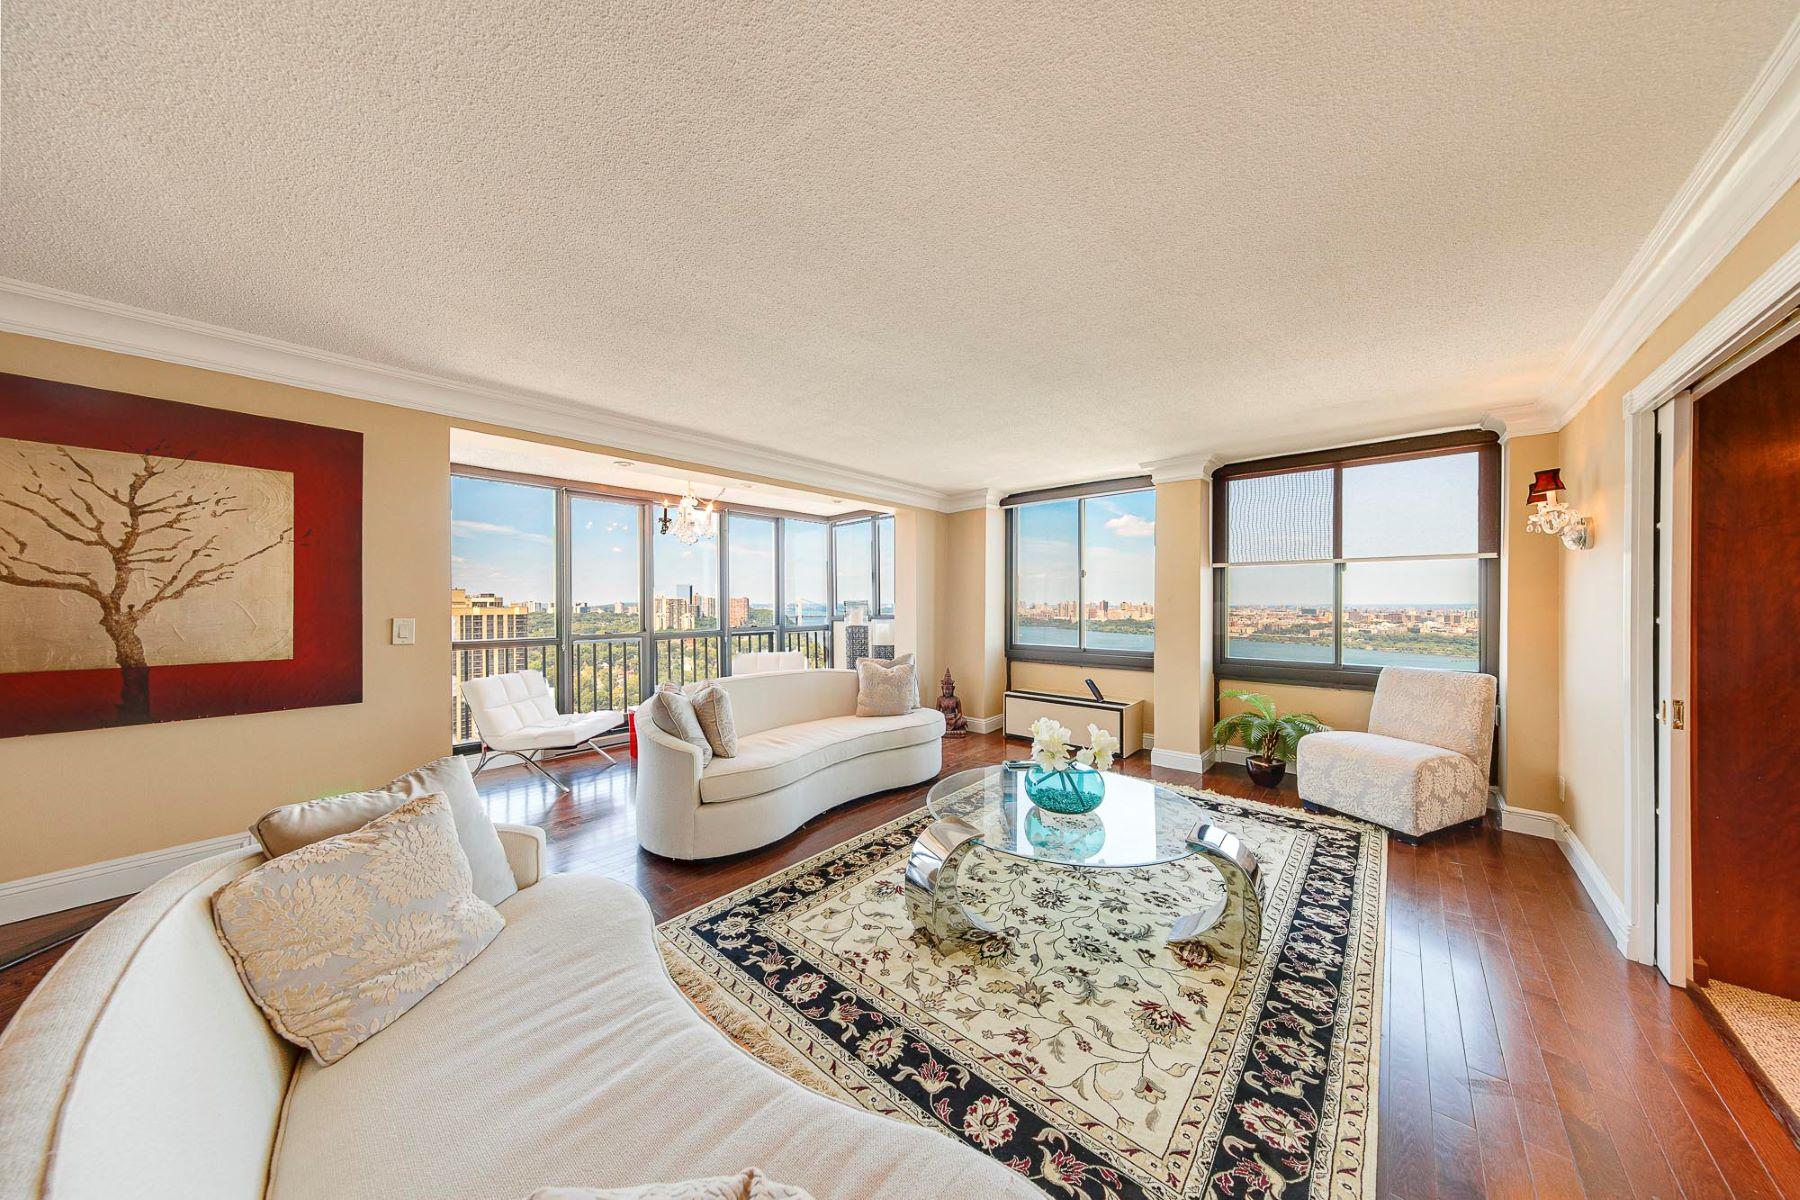 Condominiums للـ Sale في Fabulous Views 200 Winston Dr 2608, Cliffside Park, New Jersey 07010 United States